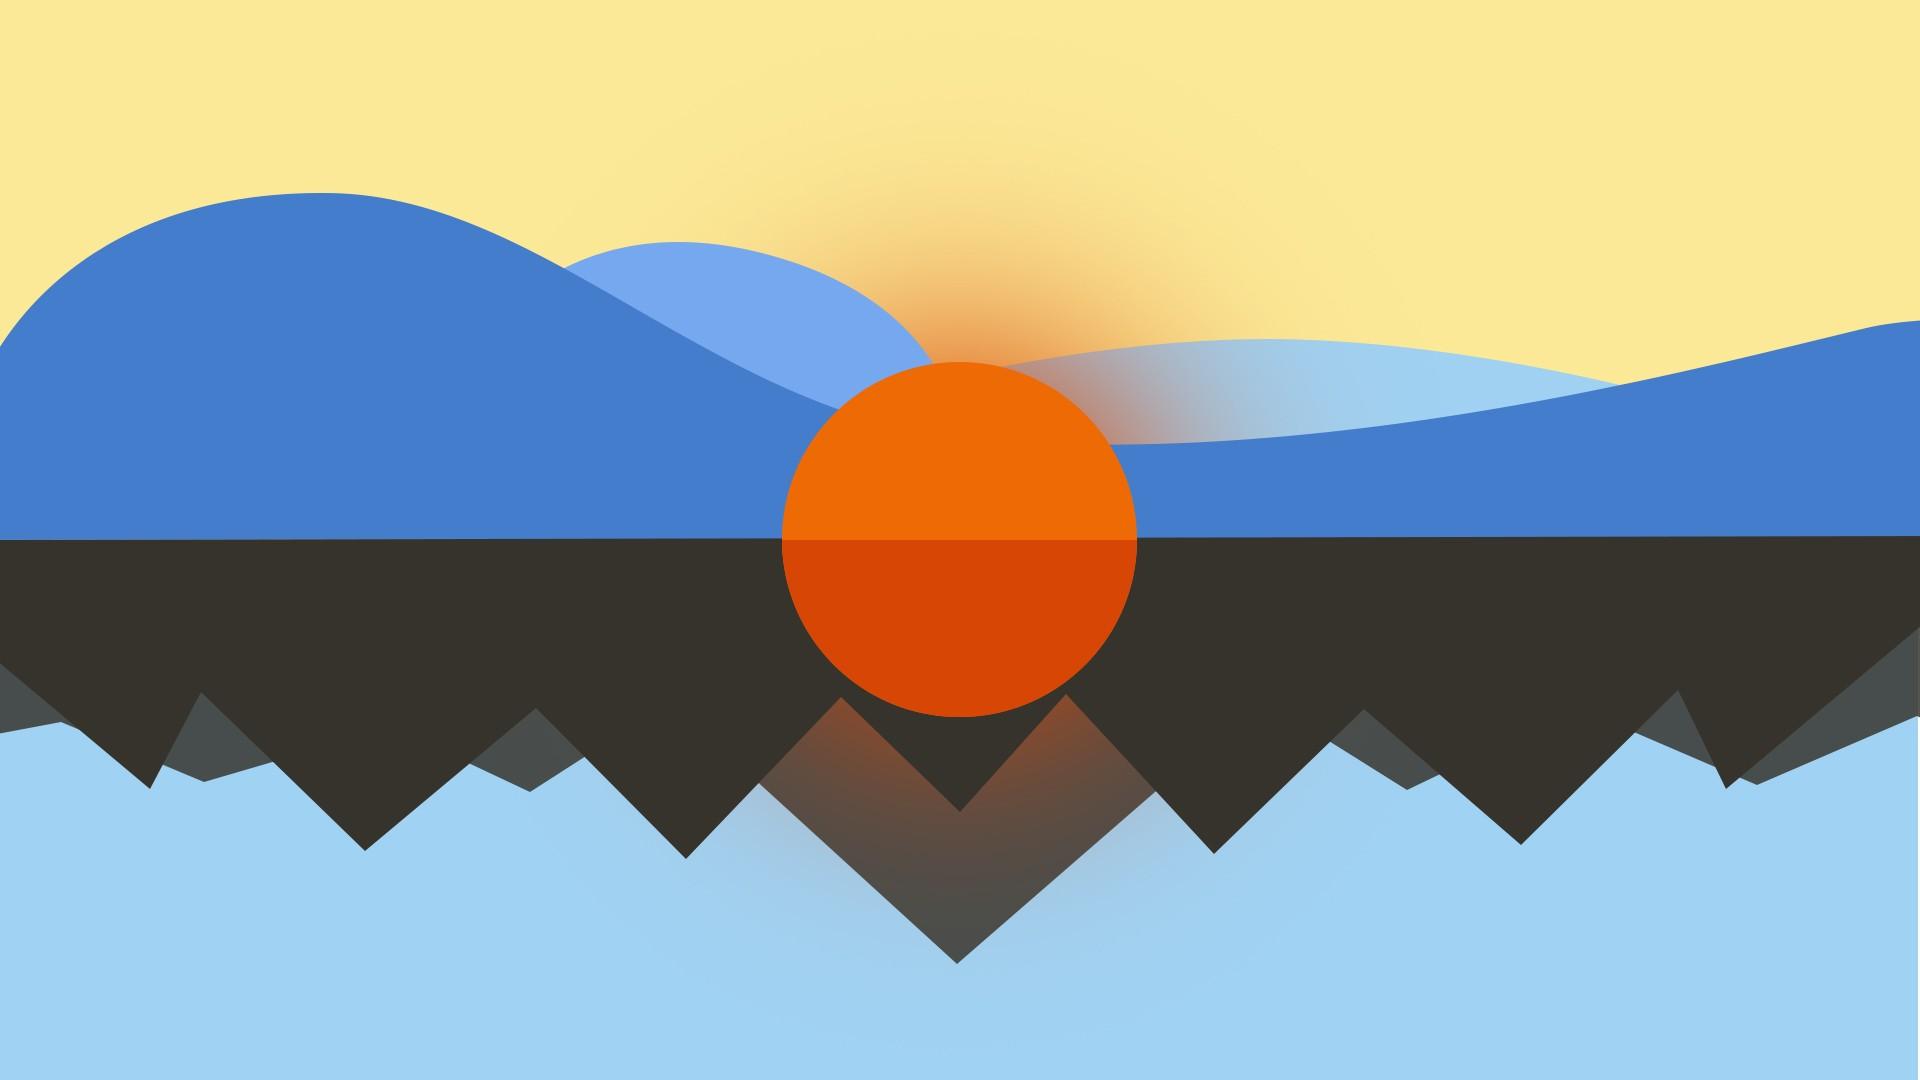 Cgi imagination sun minimalism nature digital art wallpaper download wallpaper altavistaventures Gallery